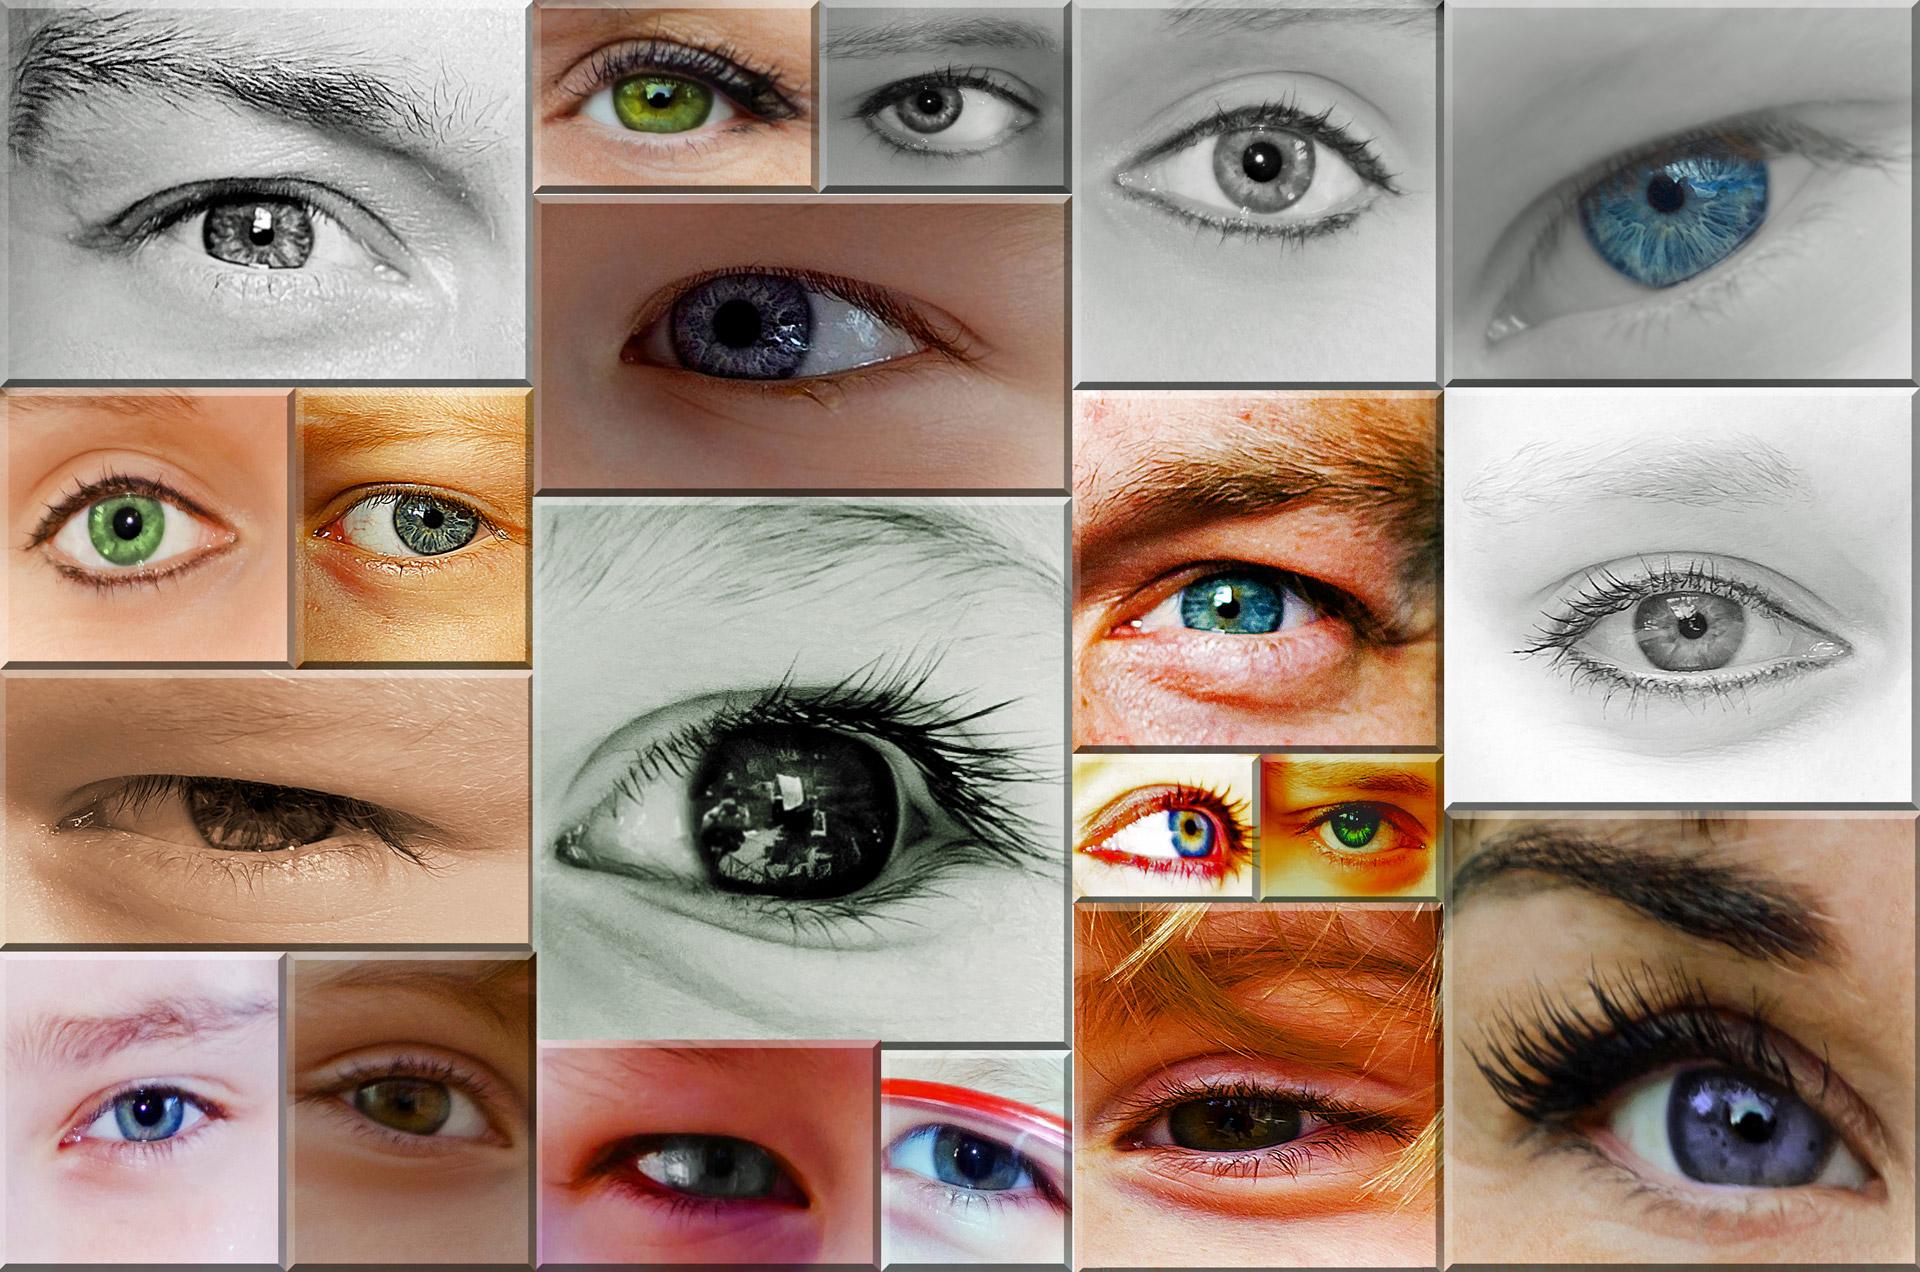 Eyes, Glaucoma, National Glaucoma Awareness Month